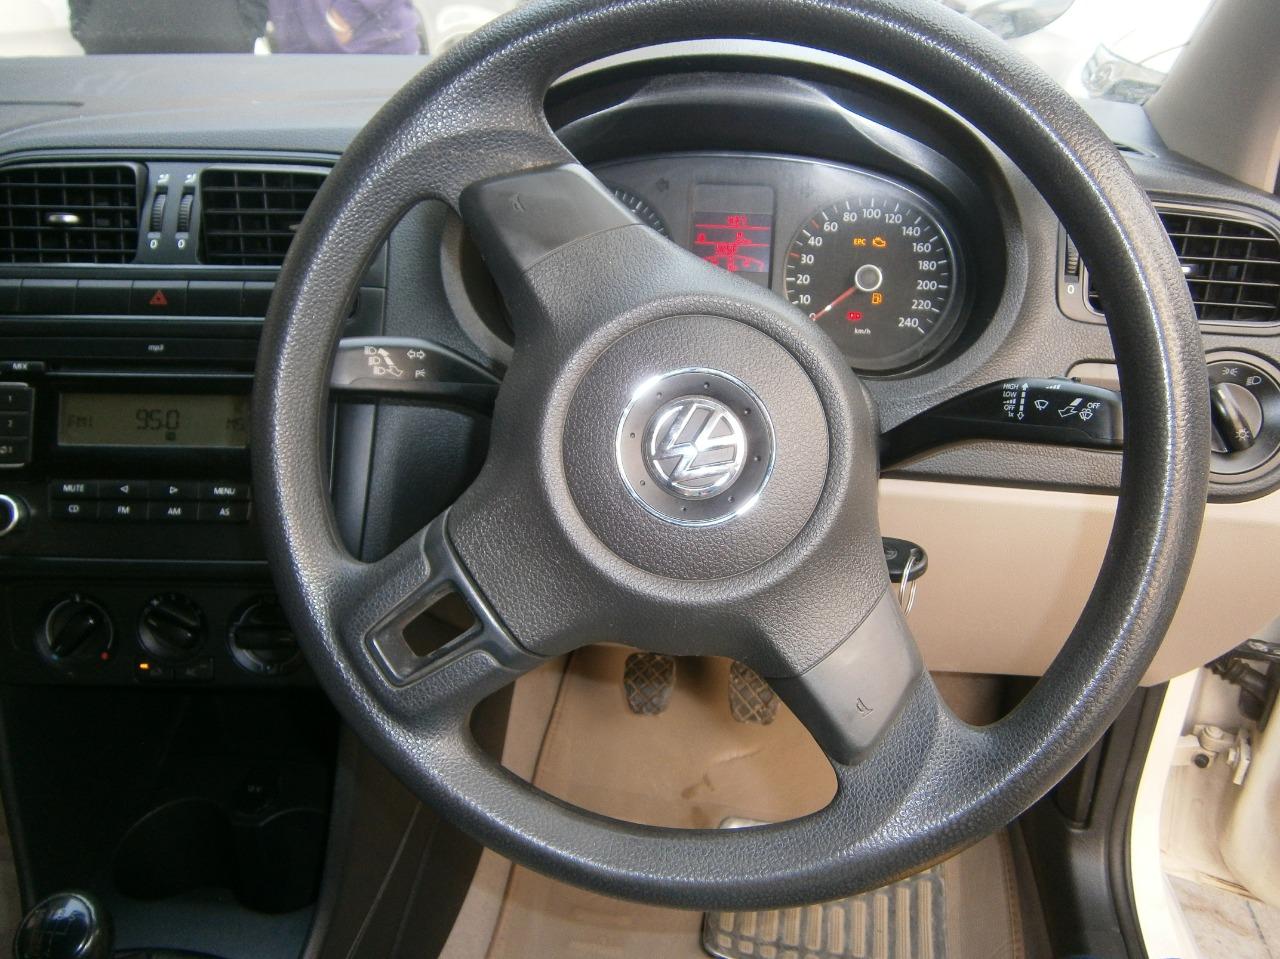 2012 Used Volkswagen Polo COMFORTLINE 1.2L PETROL